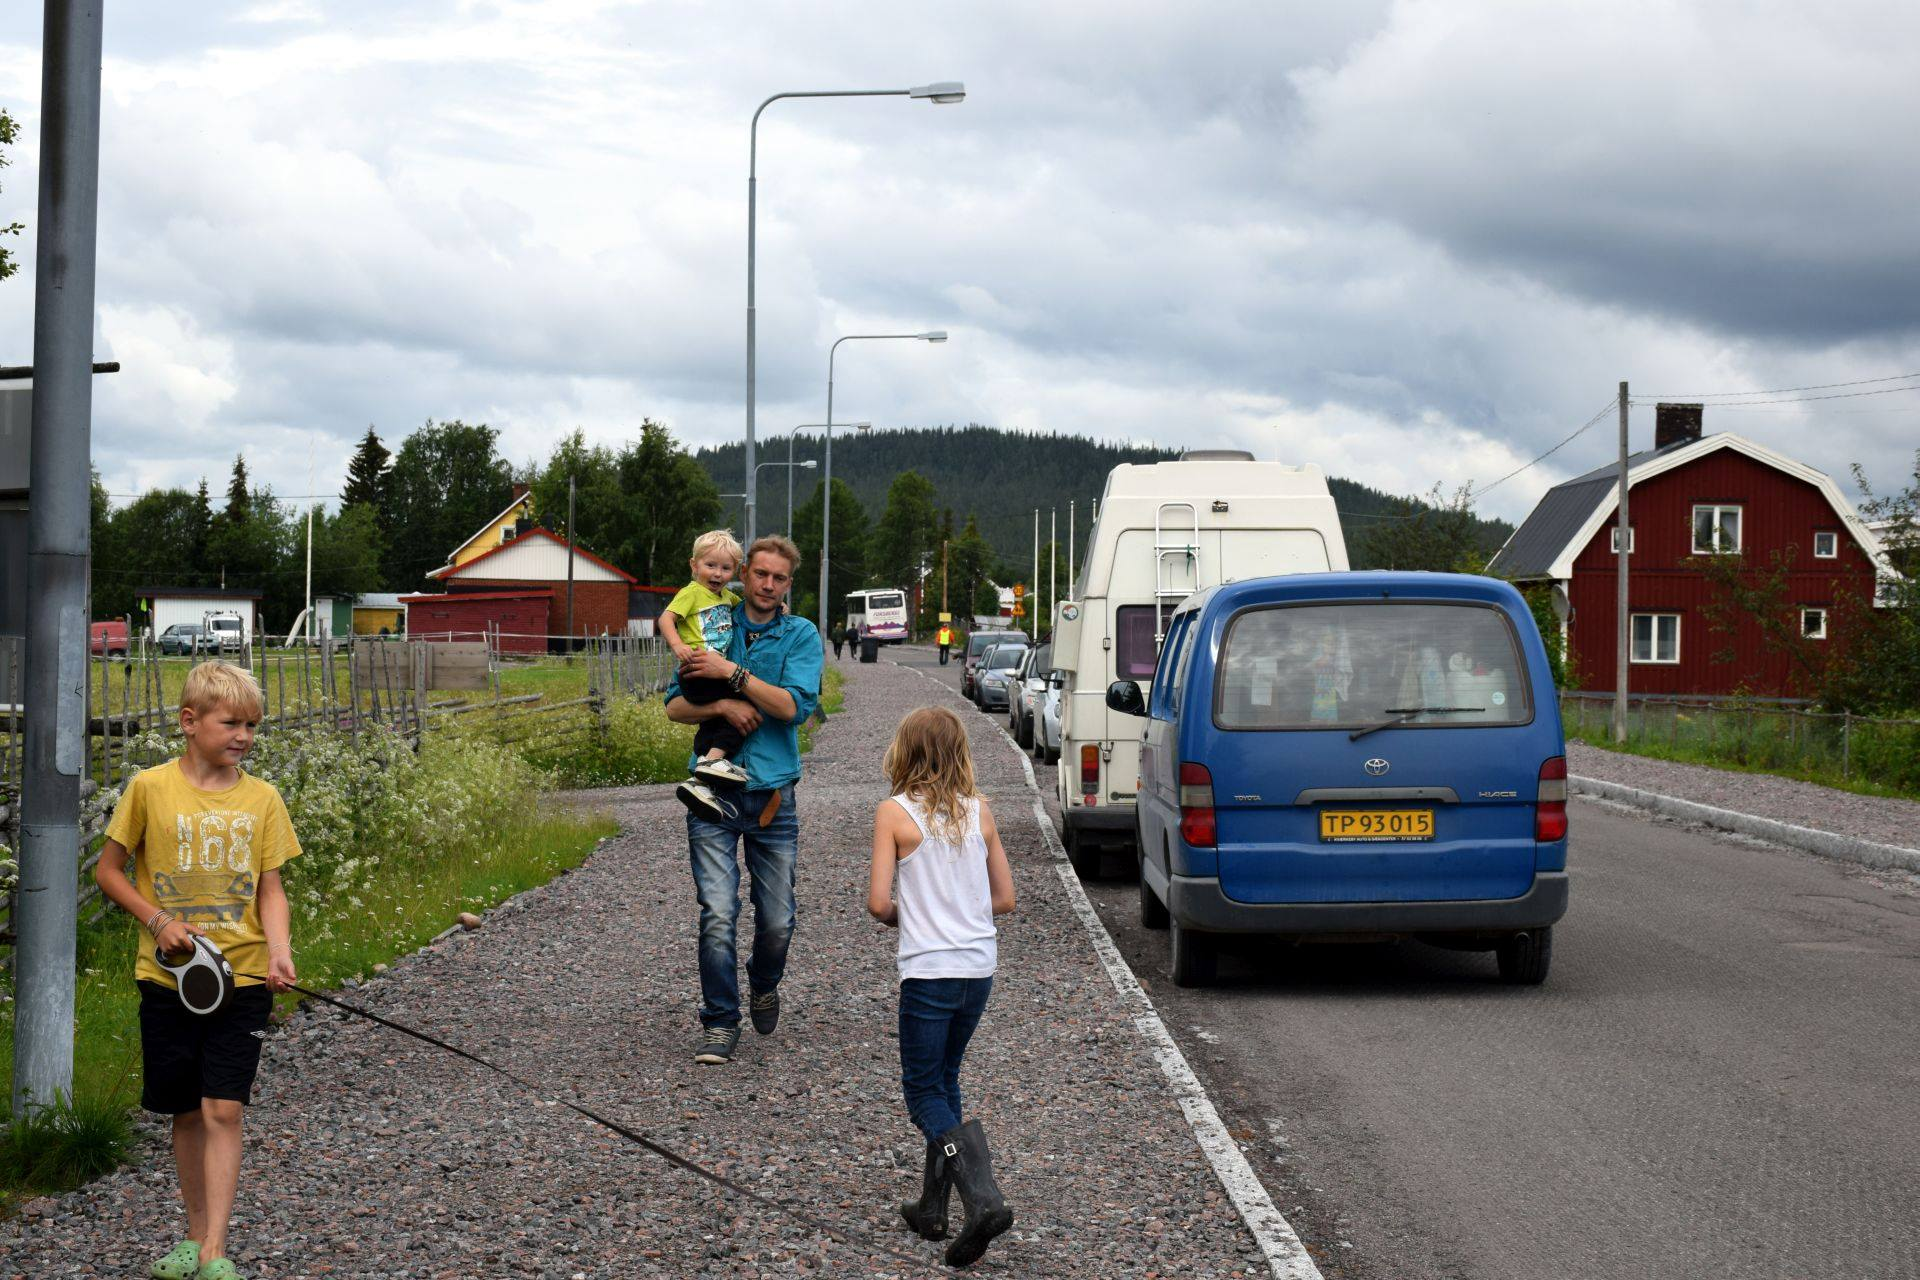 Juha and his children